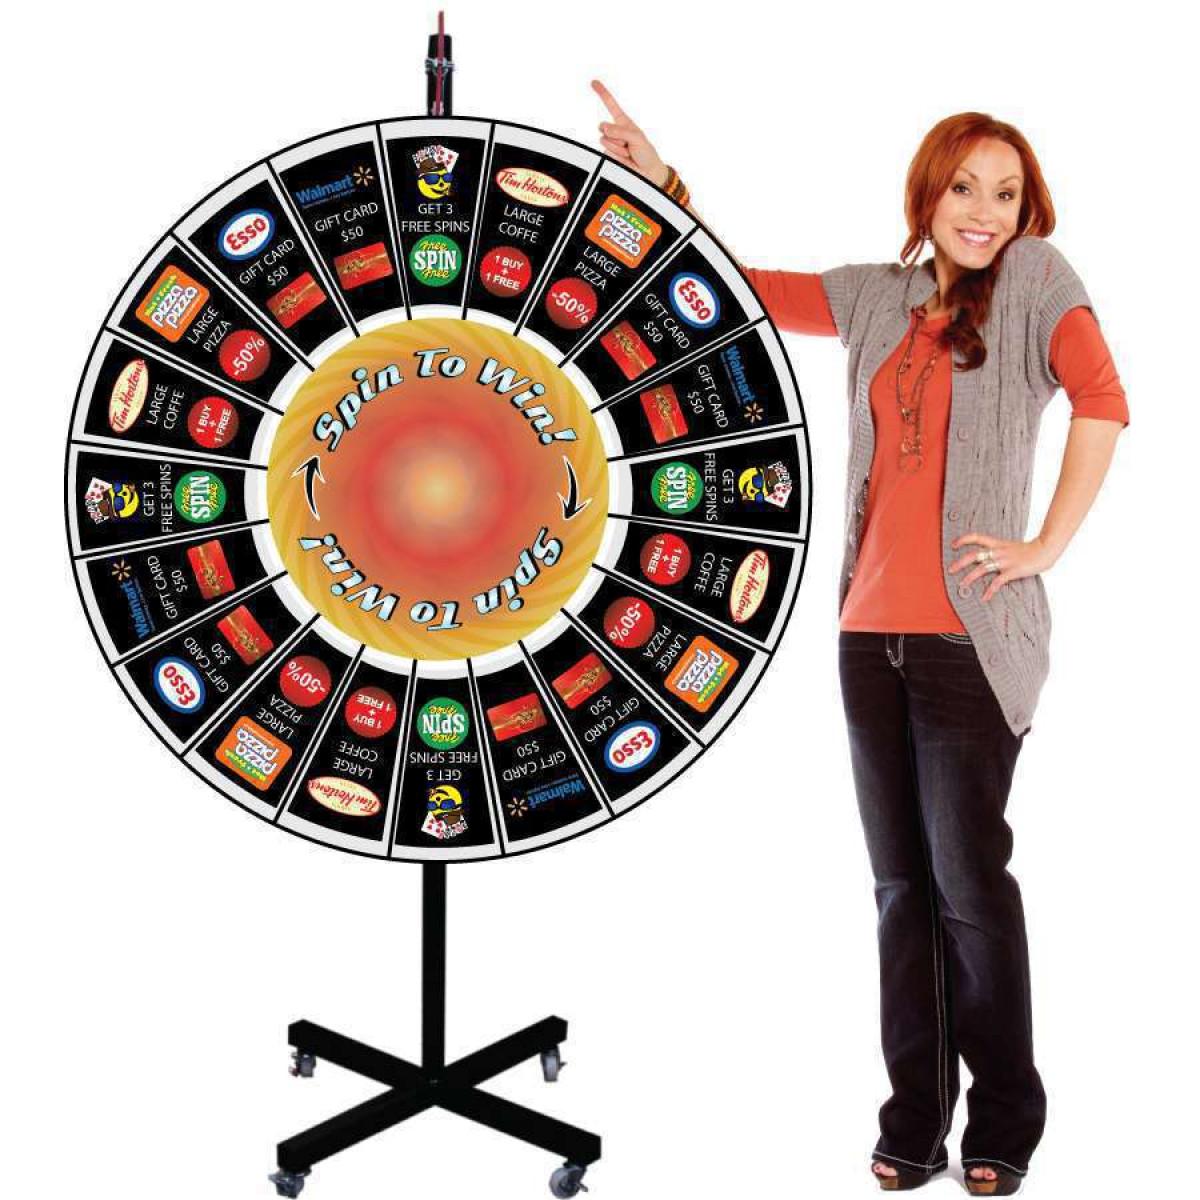 Prize Wheel 48 Inch Large Giant Pocket Insert Customizable with X Shaped  Base